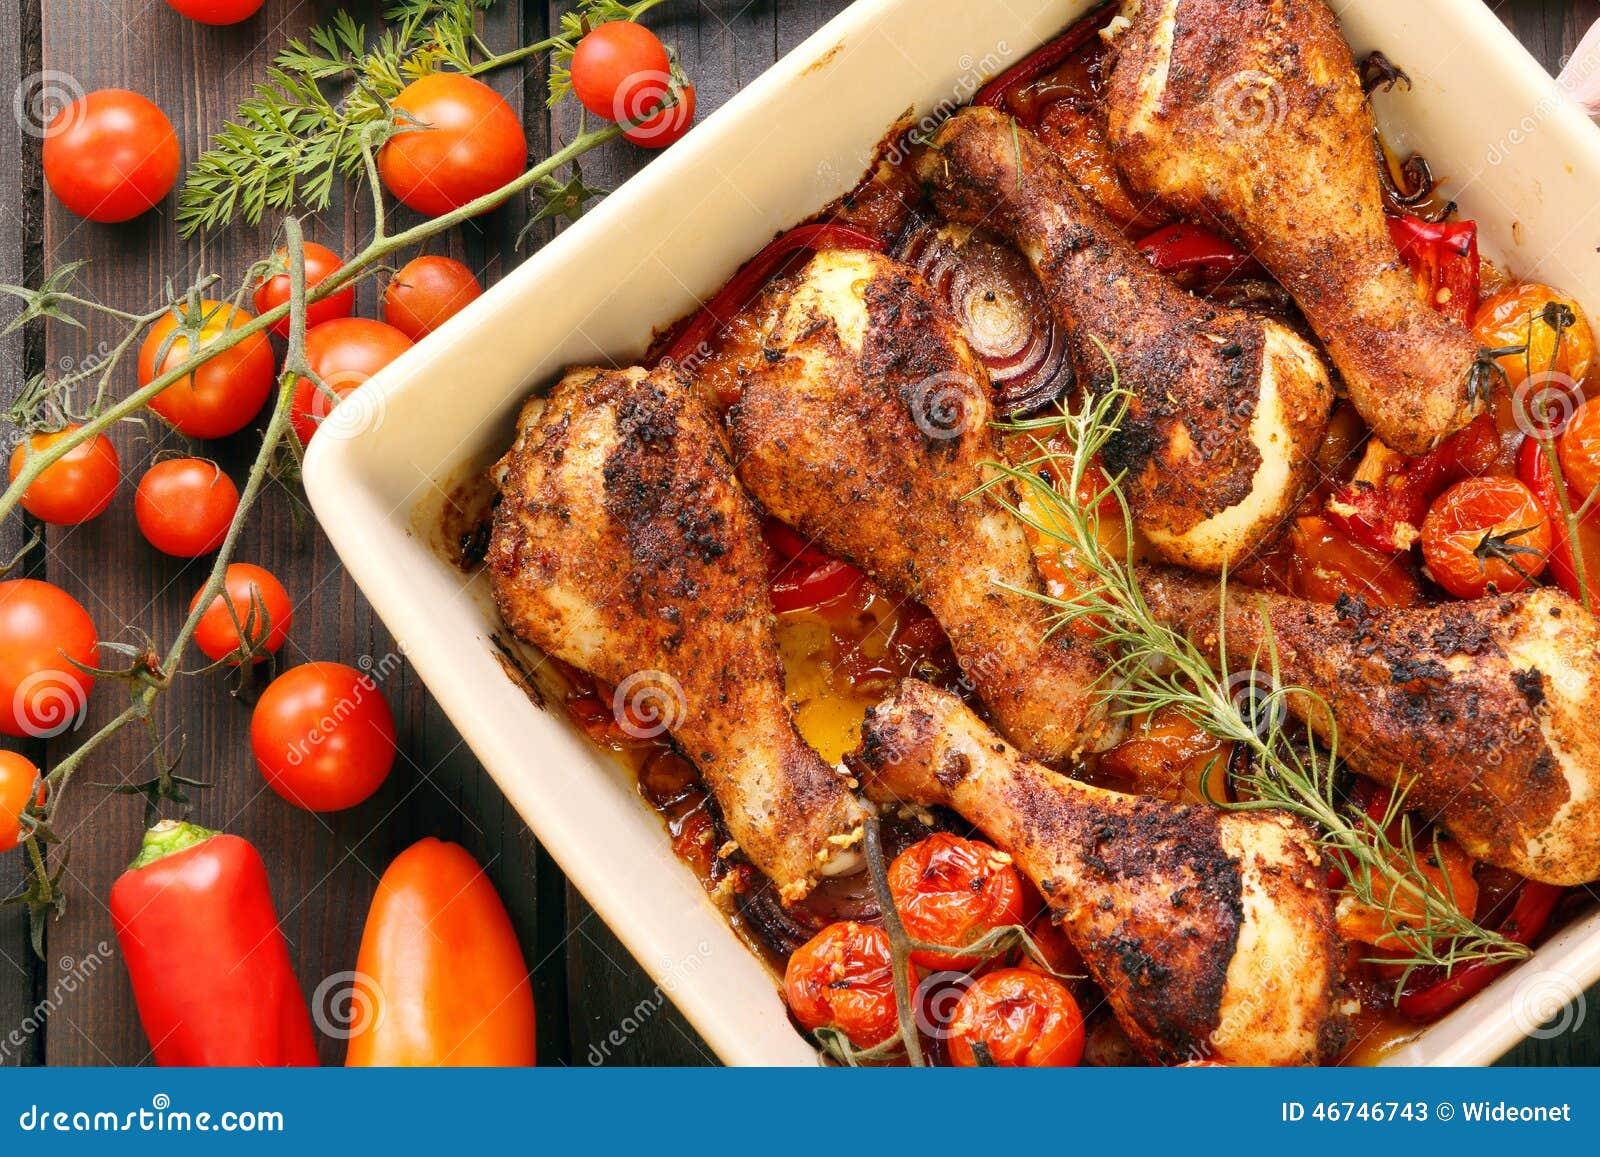 recipe: roasted drumsticks and vegetables [35]